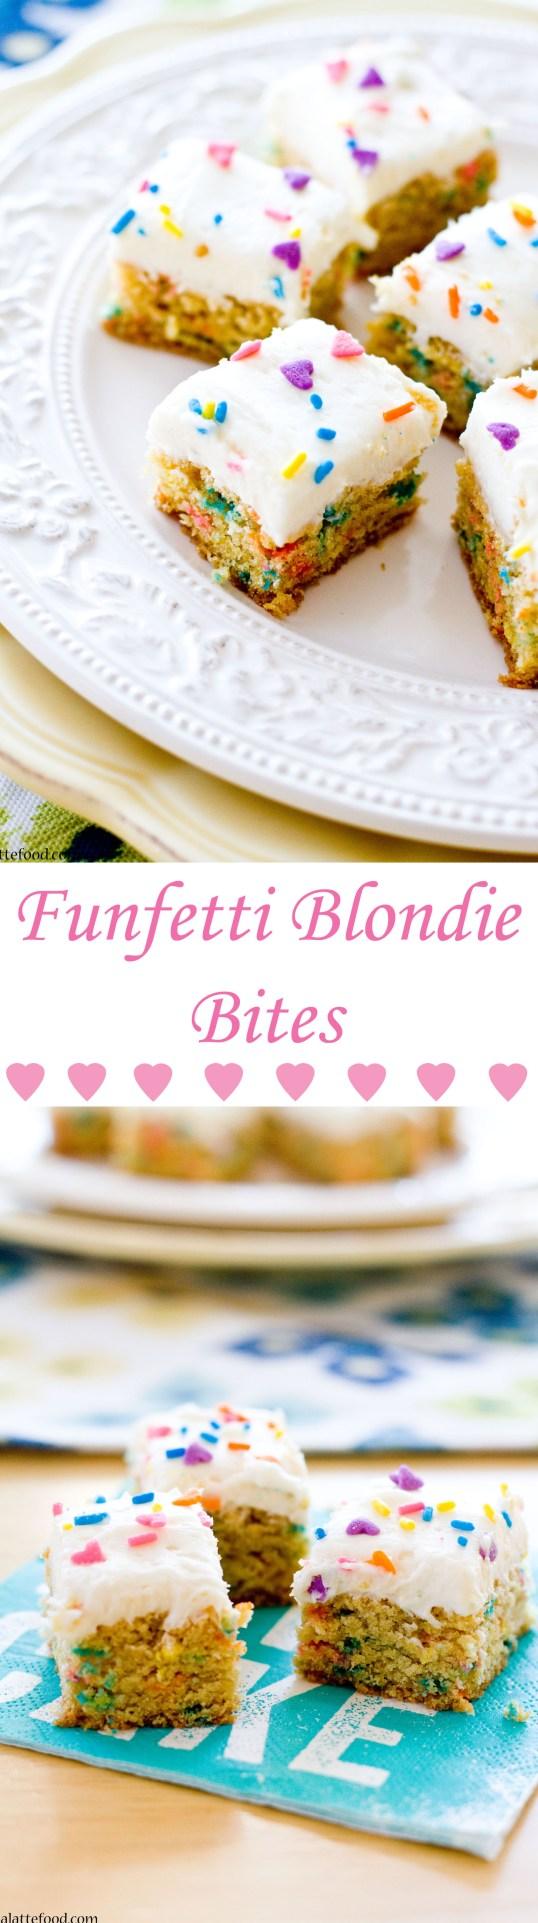 Funfetti Blondie Bites   A Latte Food